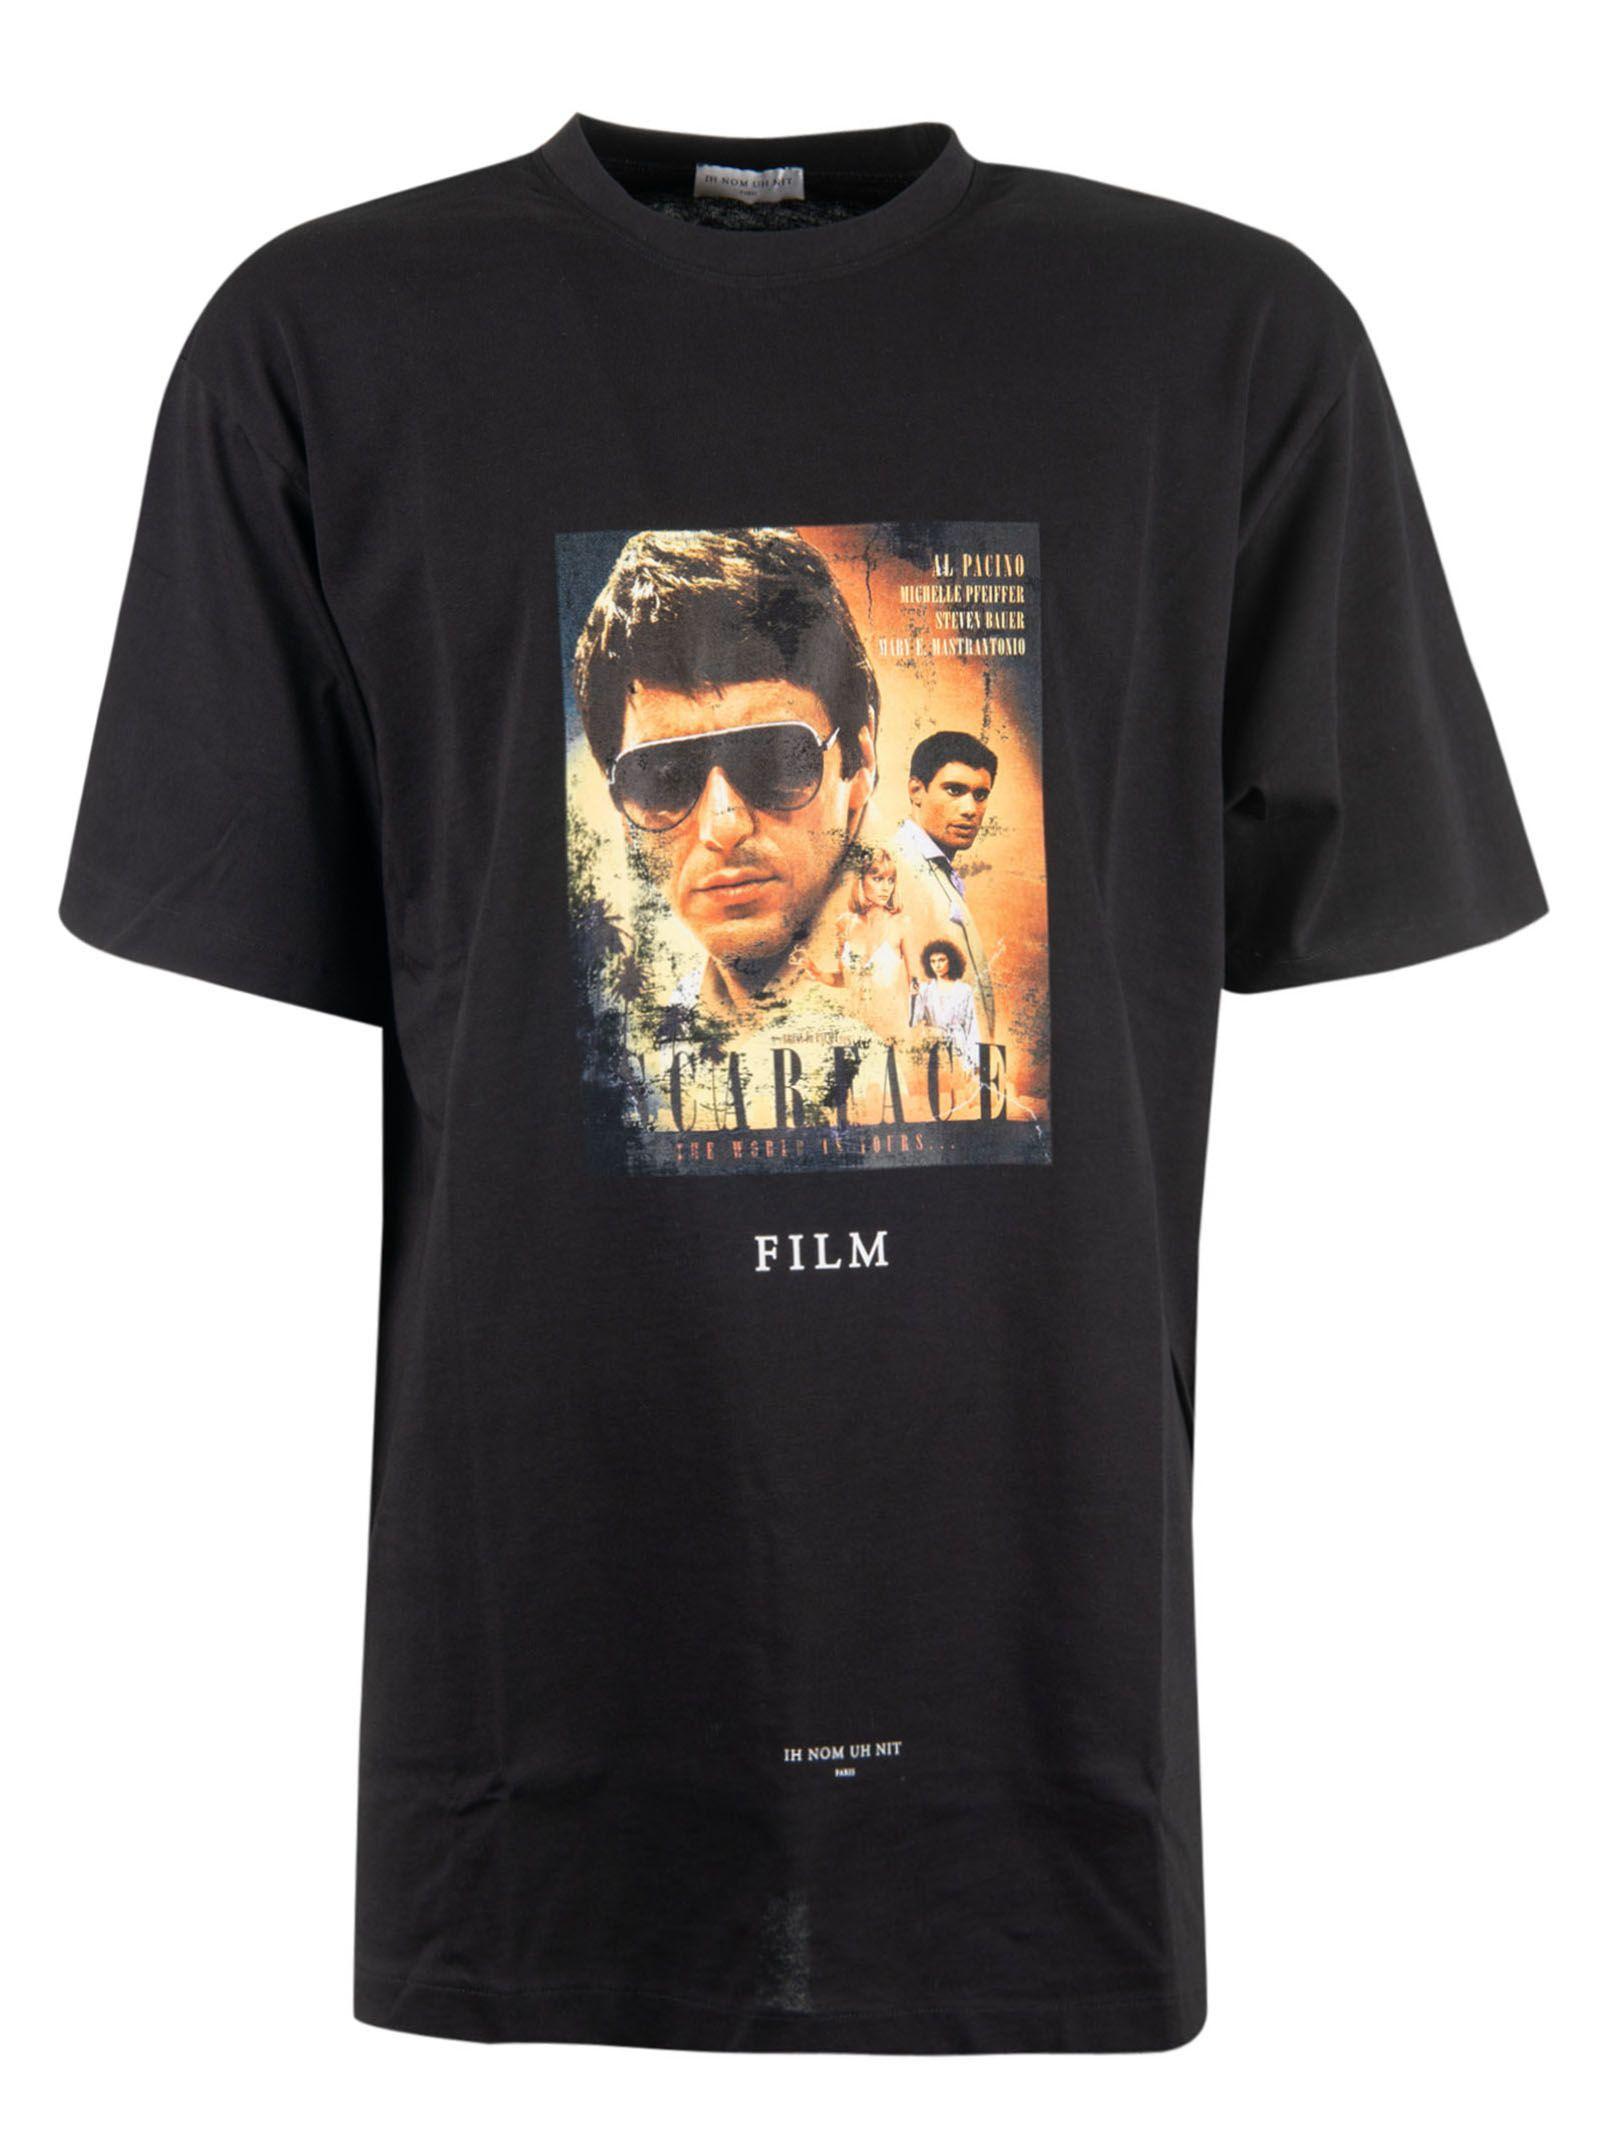 Ih Nom Uh Nit Scarface T-shirt